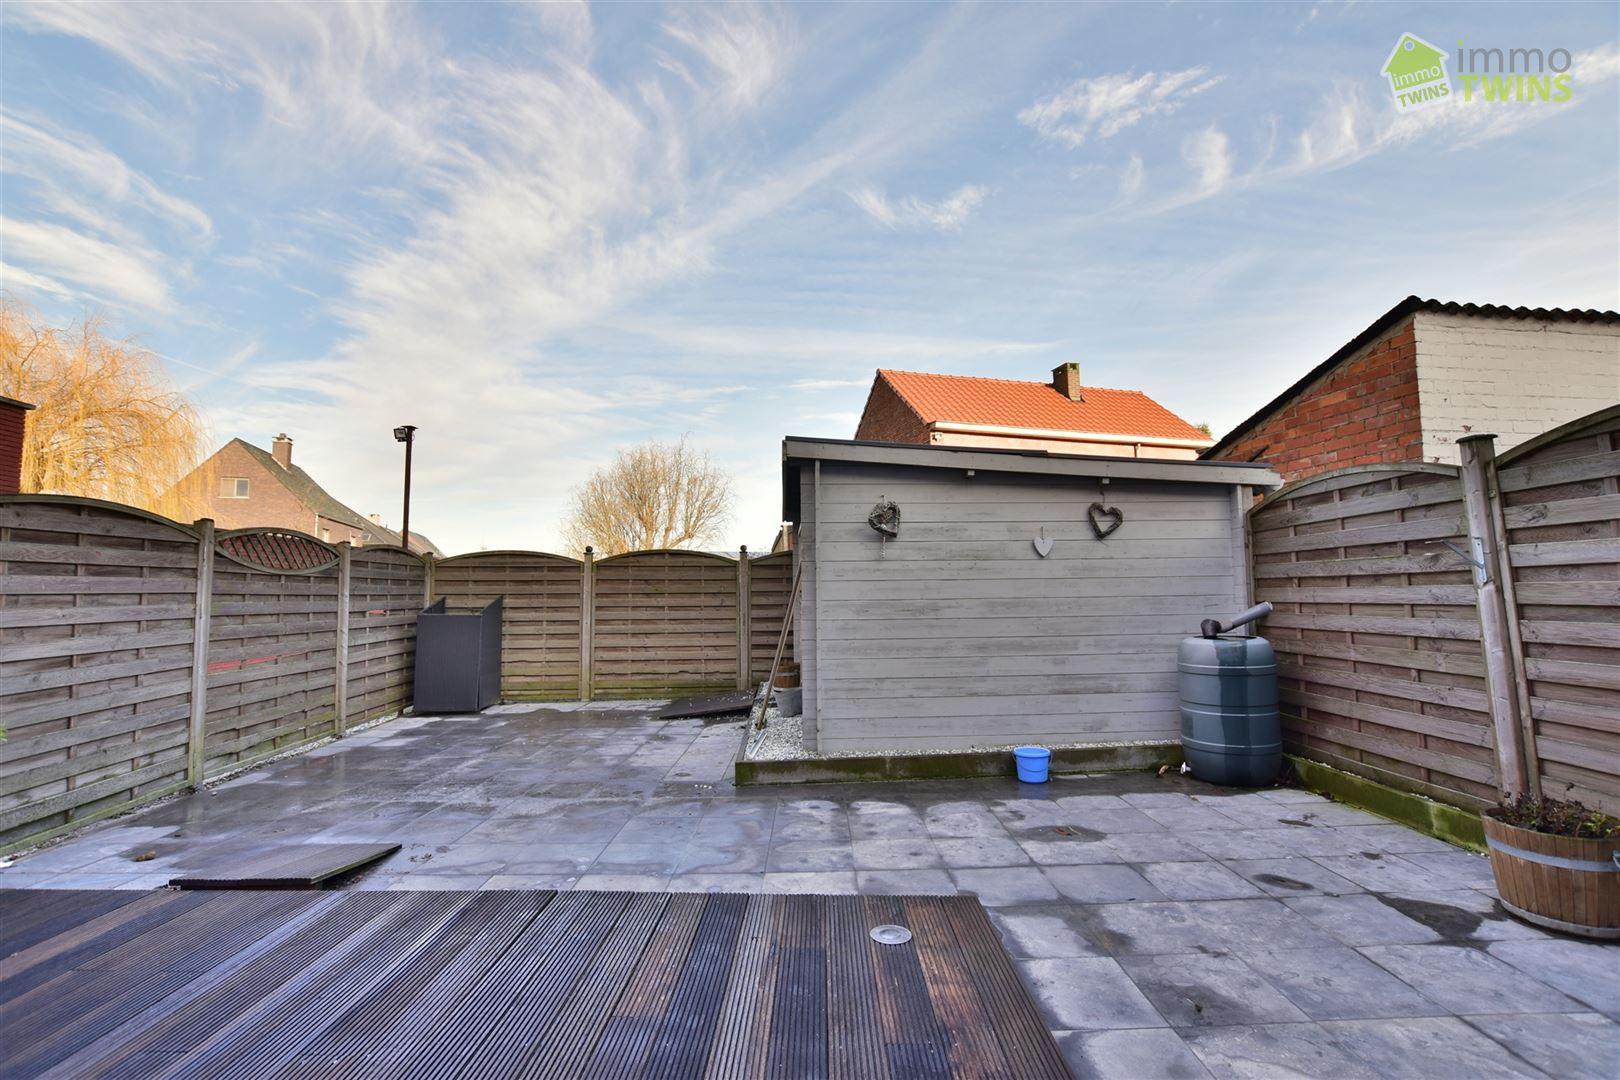 Foto 20 : Woning te 9220 MOERZEKE (België) - Prijs € 185.000